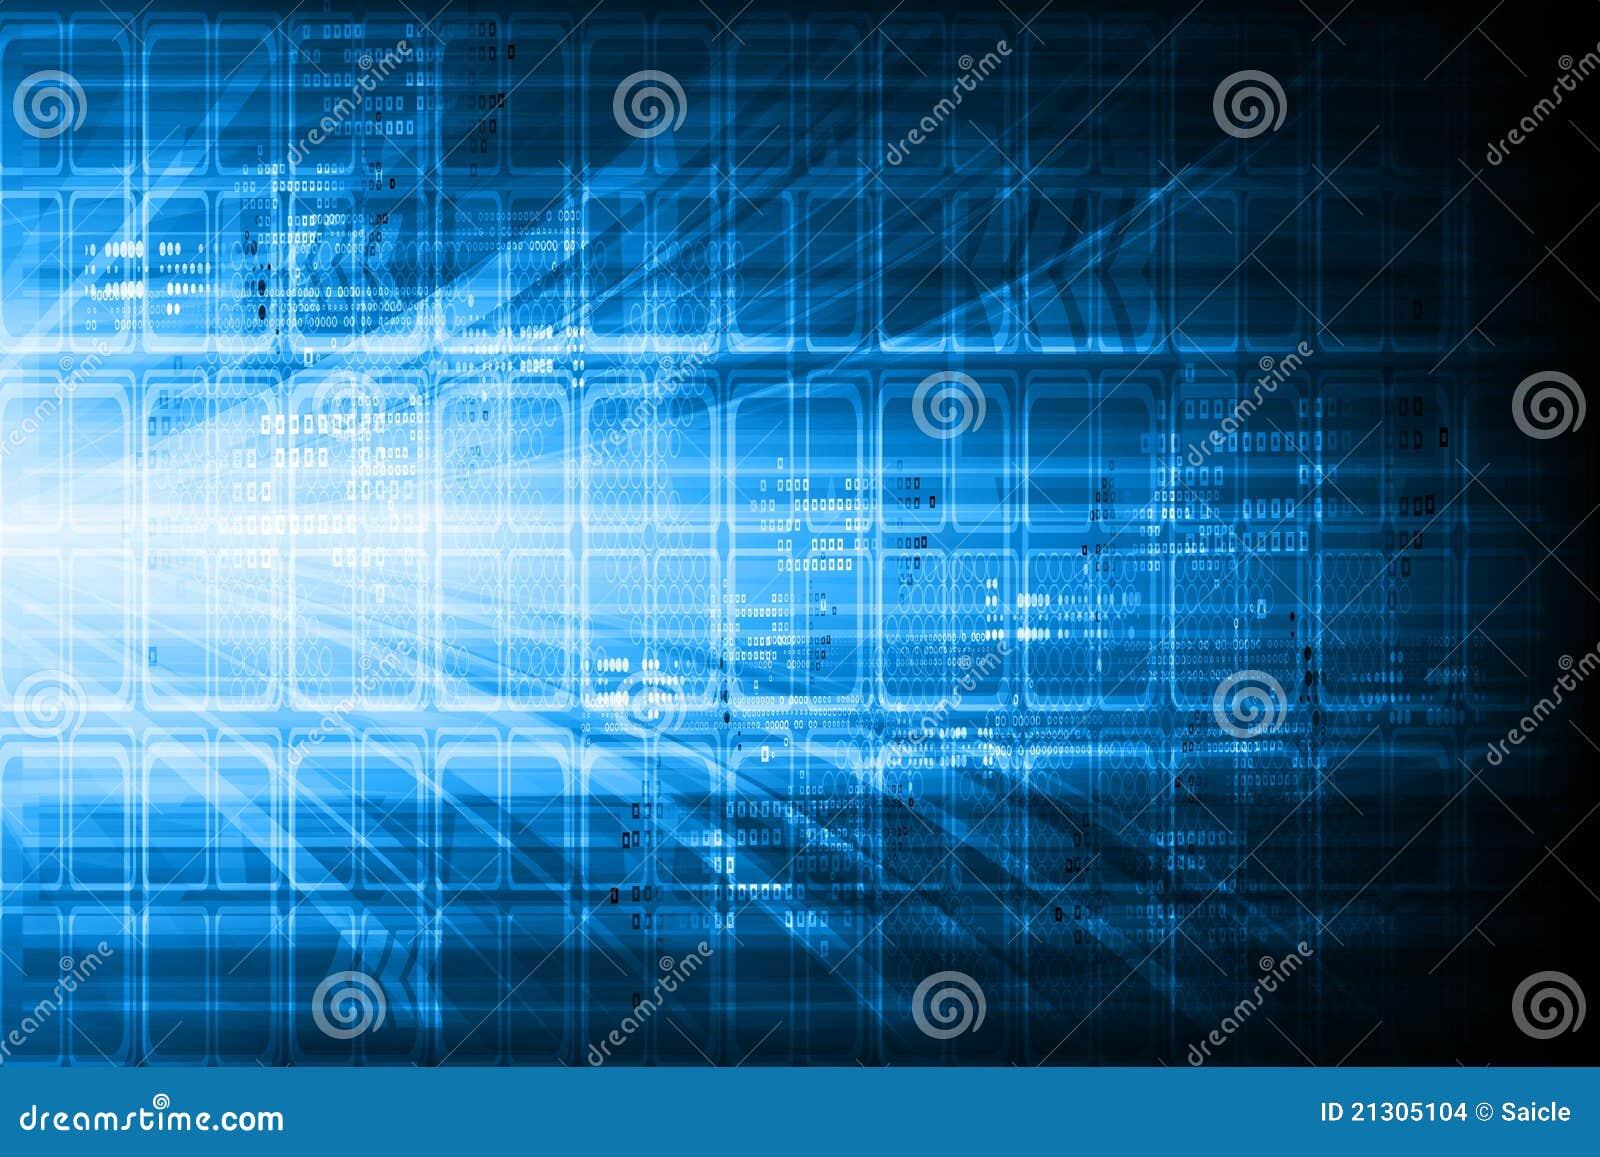 Blue technical design